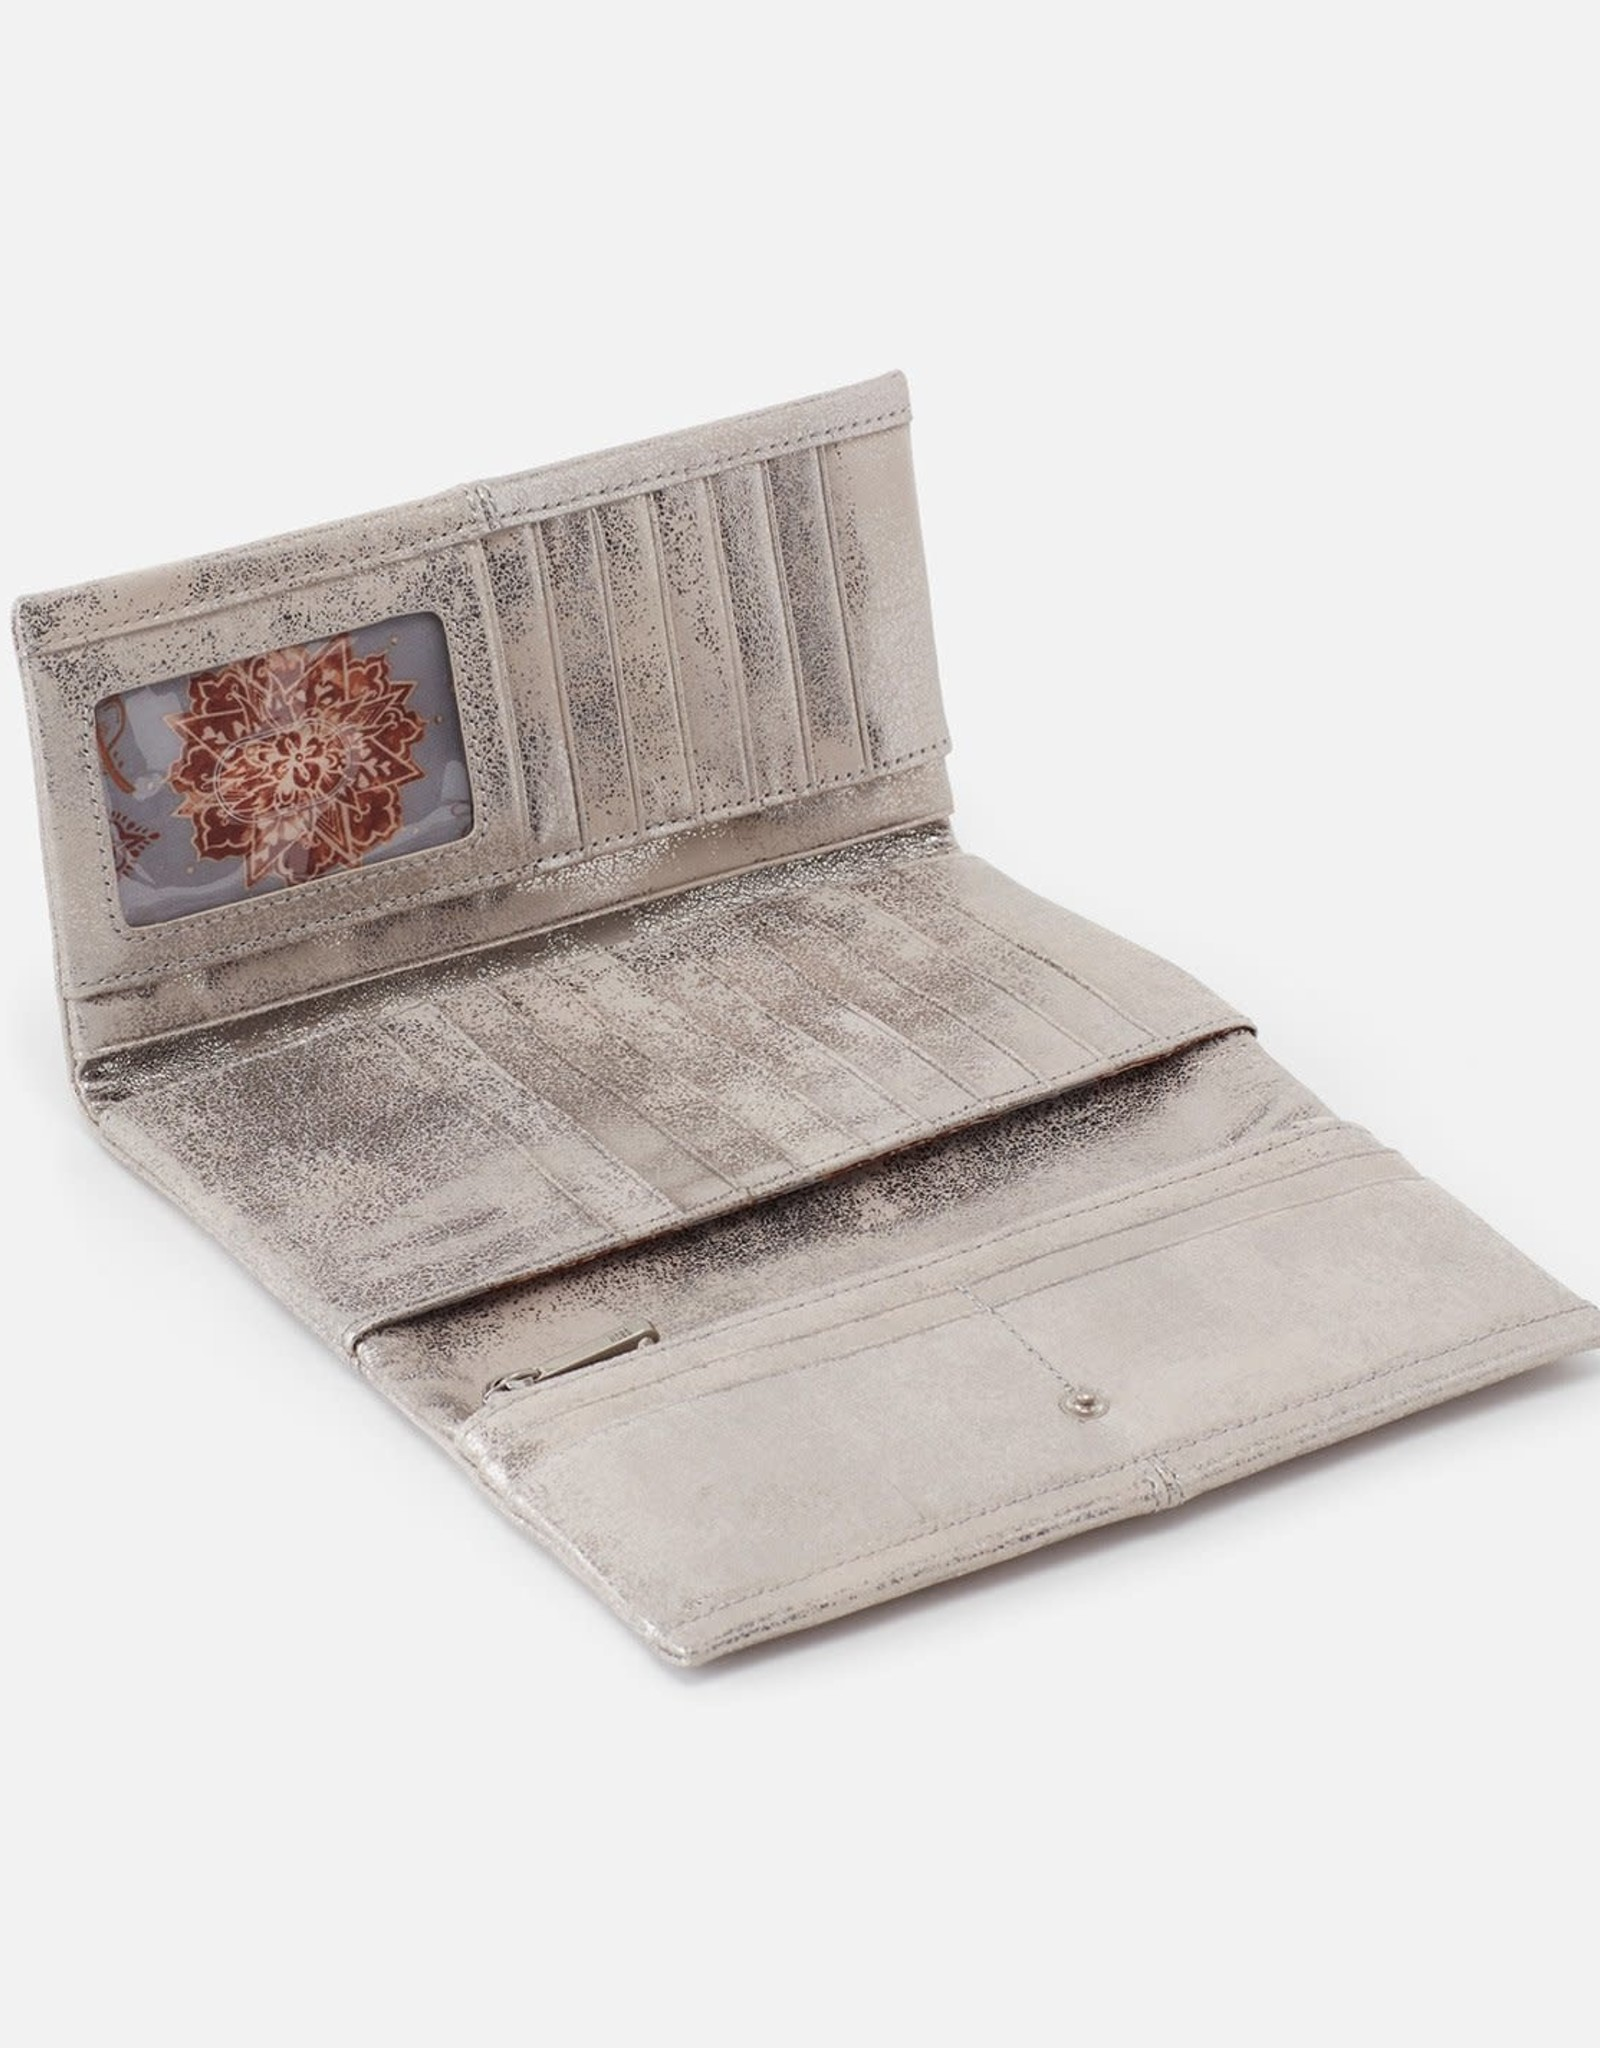 Hobo International Hobo Keen Distressed Platinum Wallet